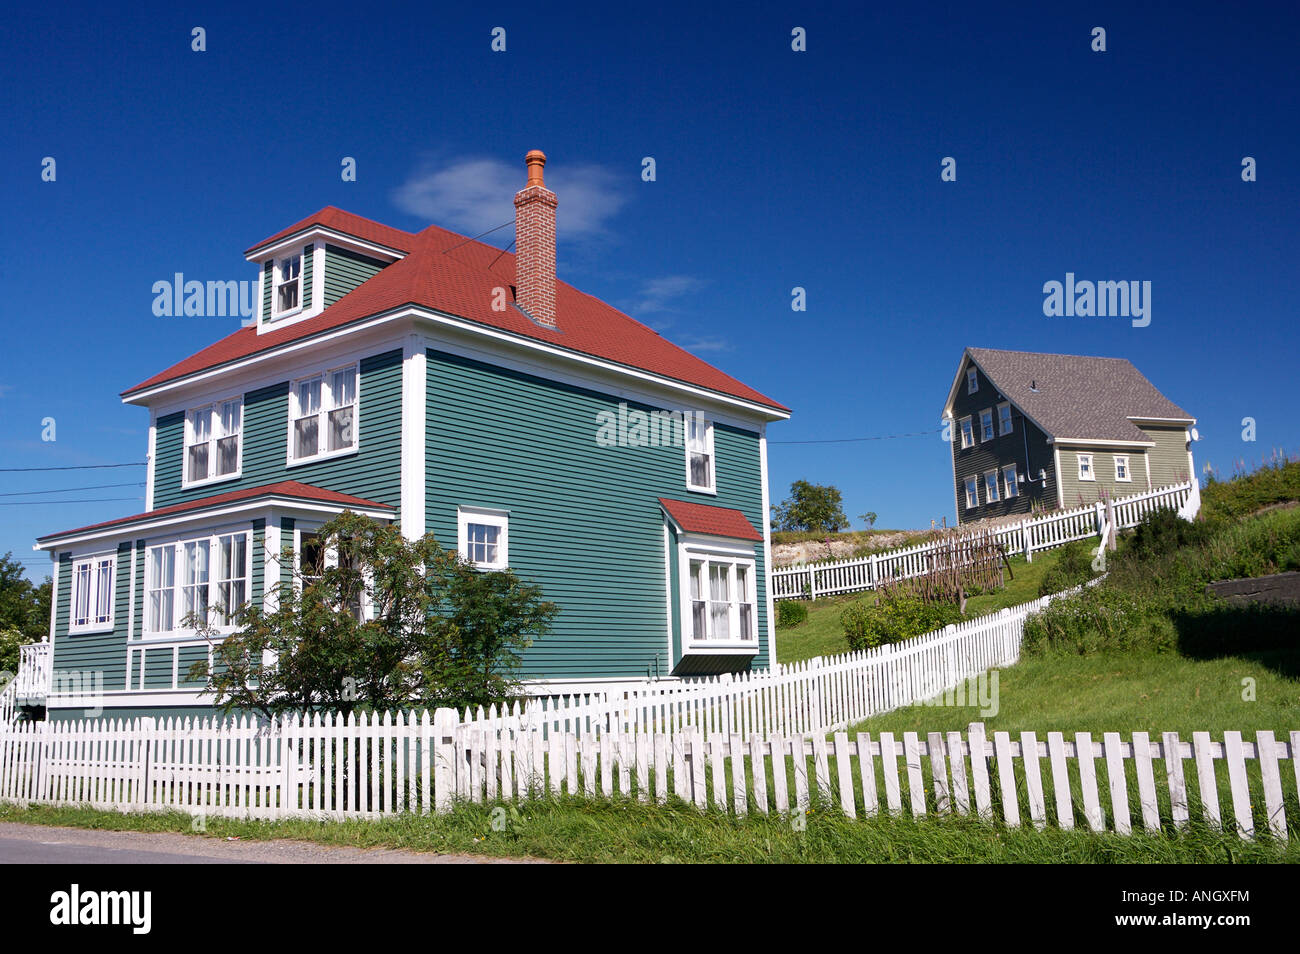 Houses with white picket fences in the town of Trinity, Bonavista Peninsula, Trinity Bay, Discovery Trail, Newfoundland - Stock Image